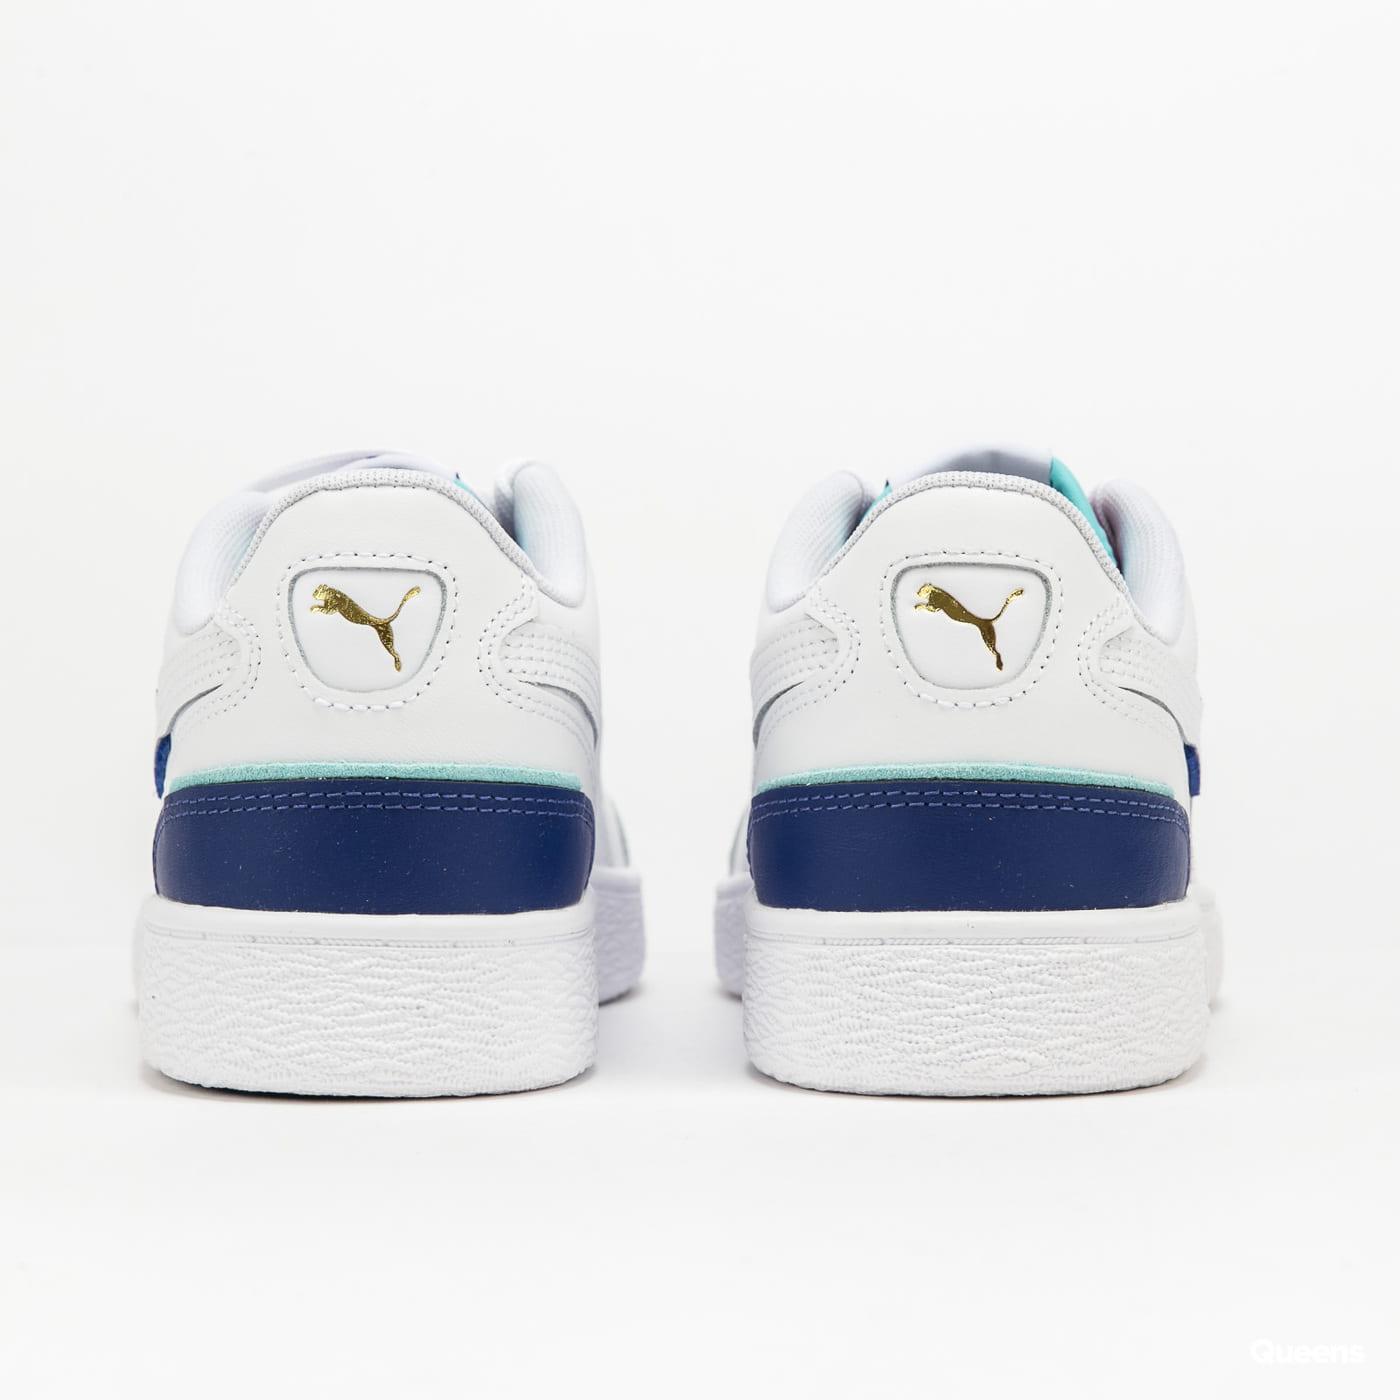 Puma Ralph Sampson Lo Joker puma white / elektro blue